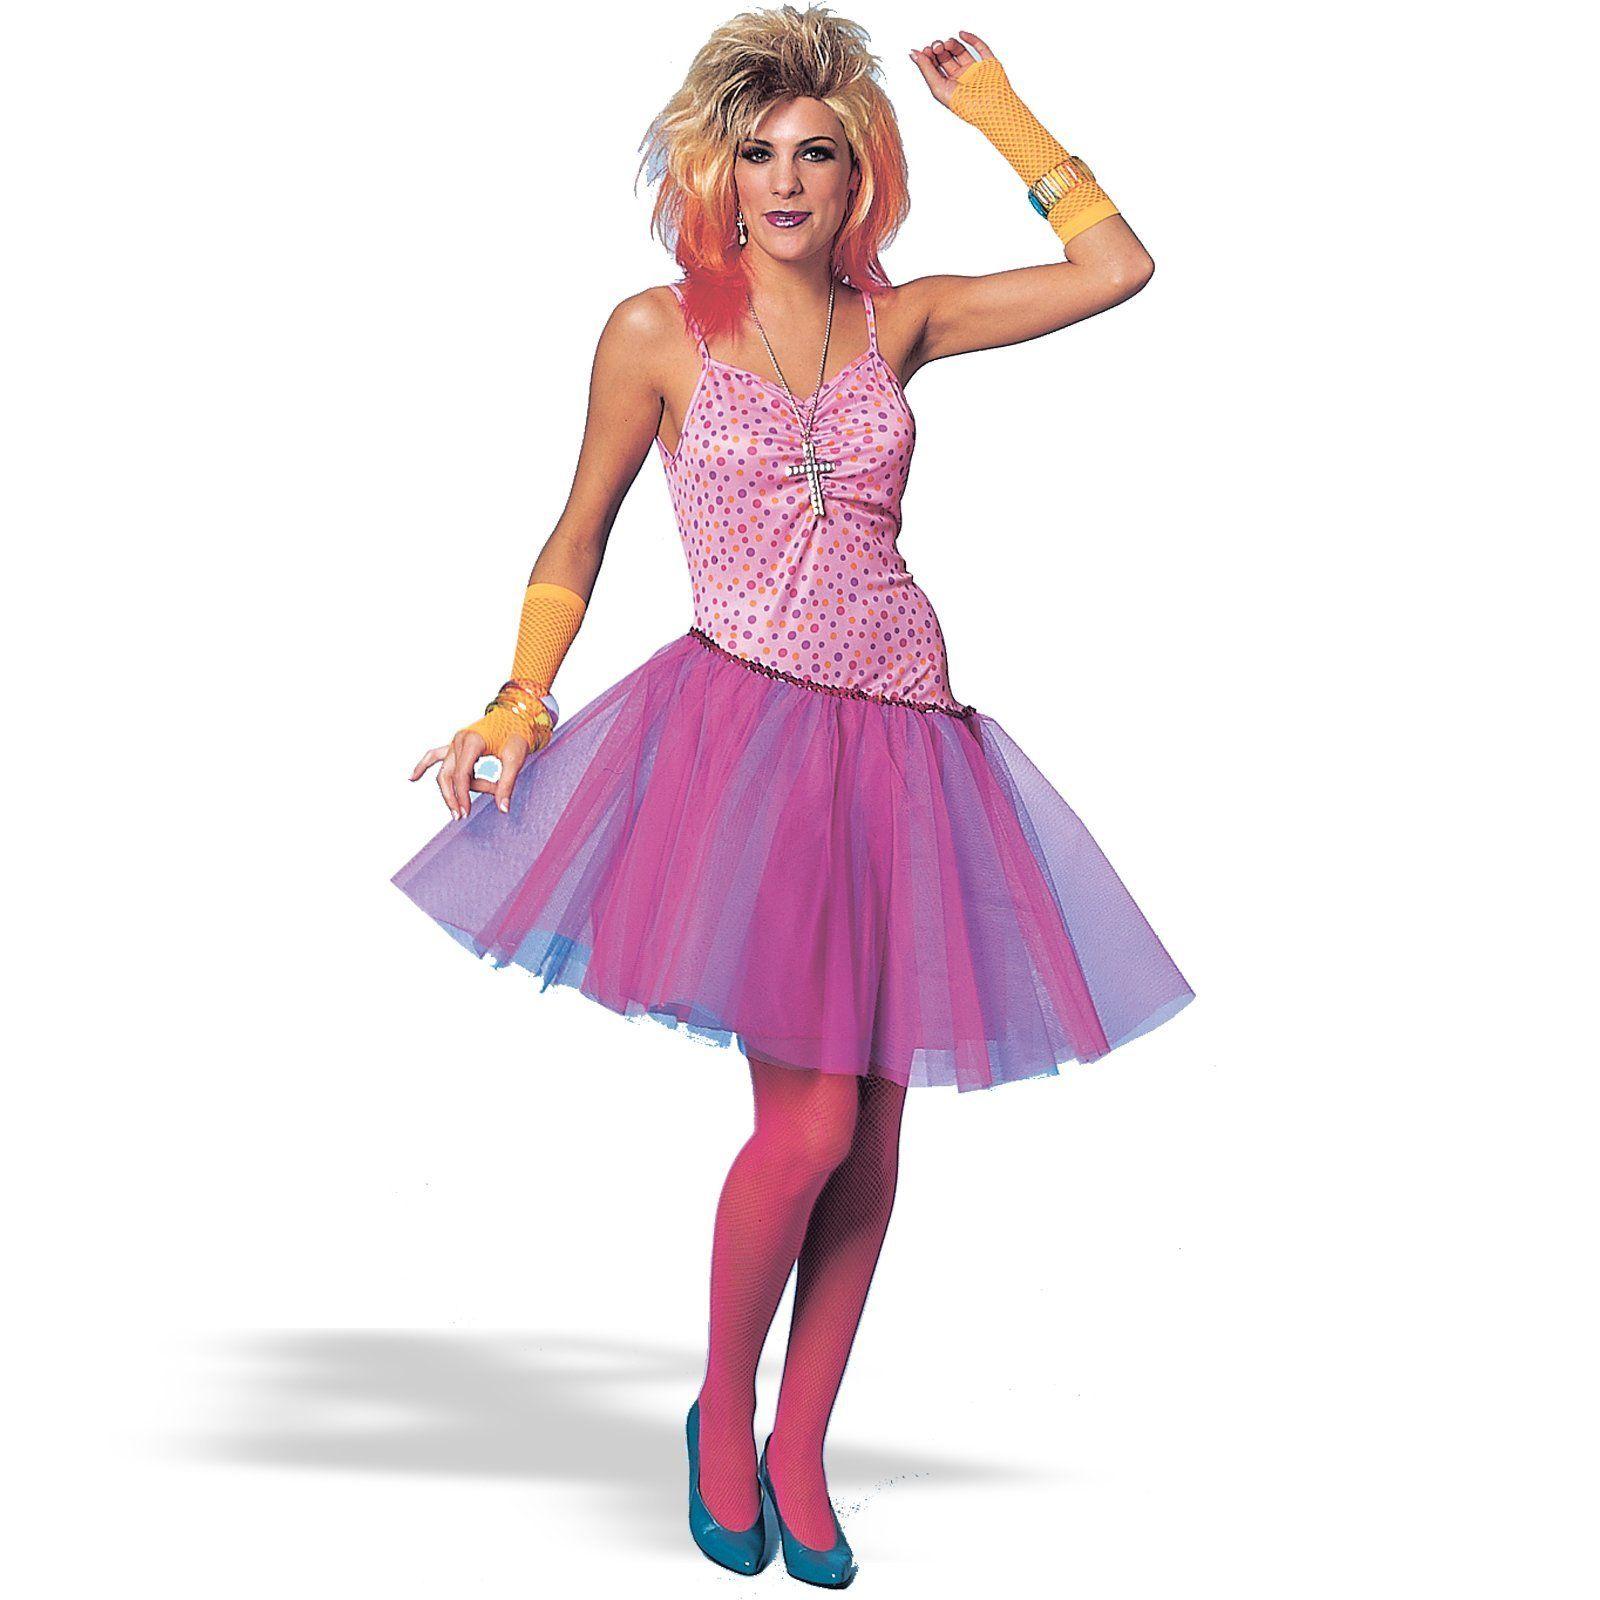 Popular dress styles 80s fashion